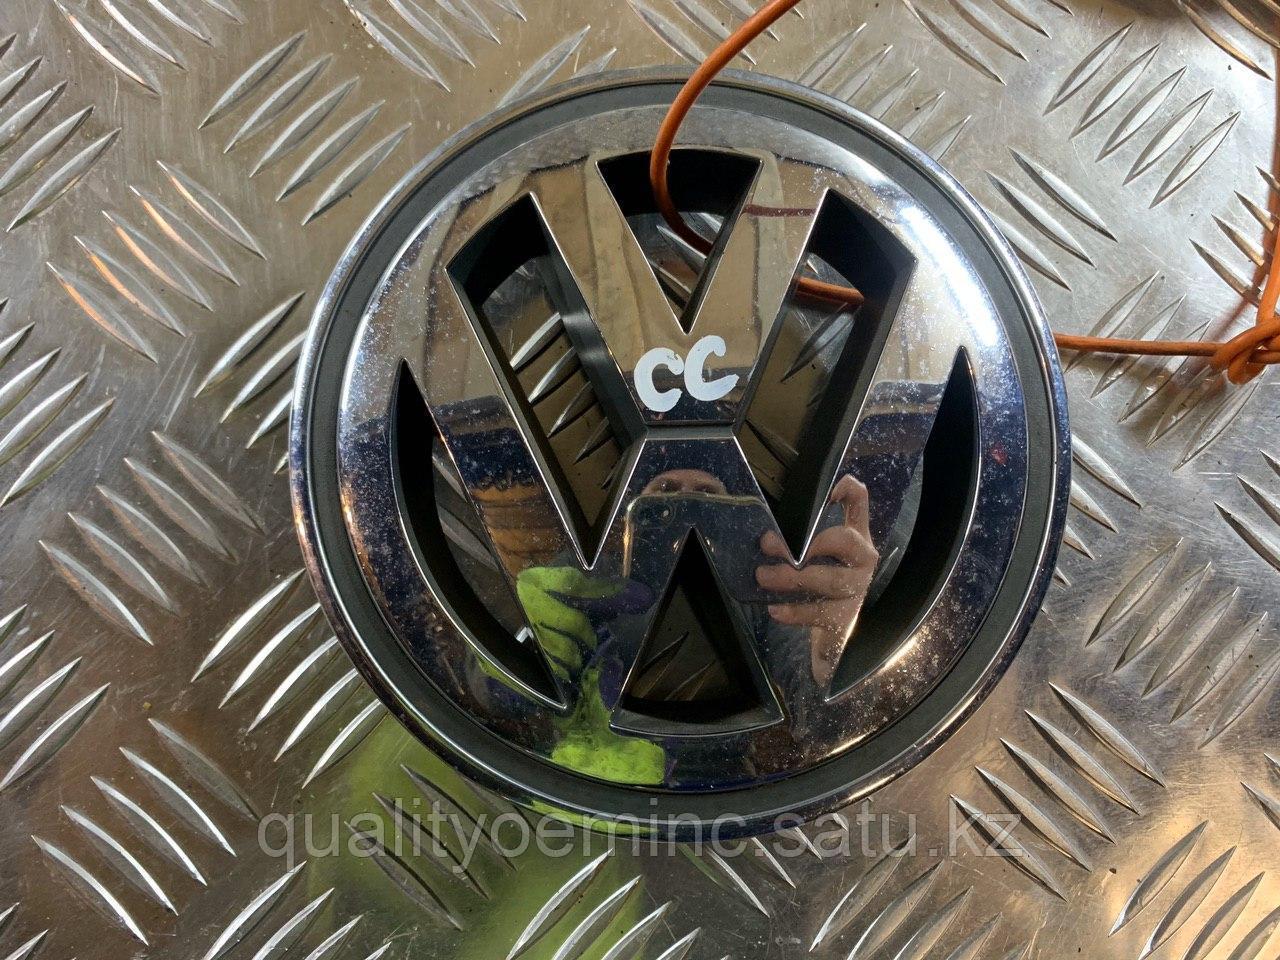 1K5853600 - Решетка радиатора Volkswagen GOLF V